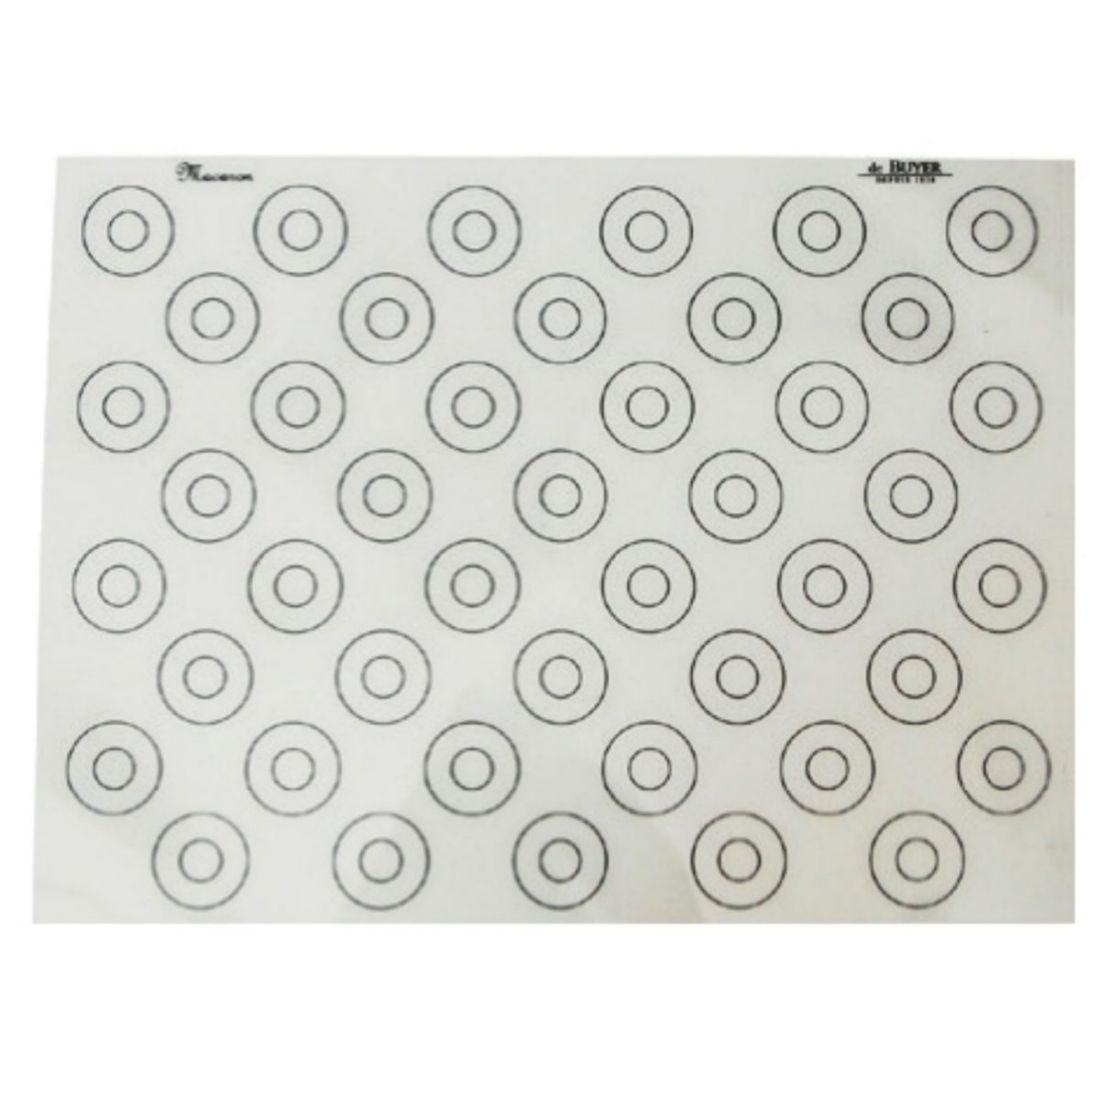 Podložka silikonová Macaron 40x30 cm